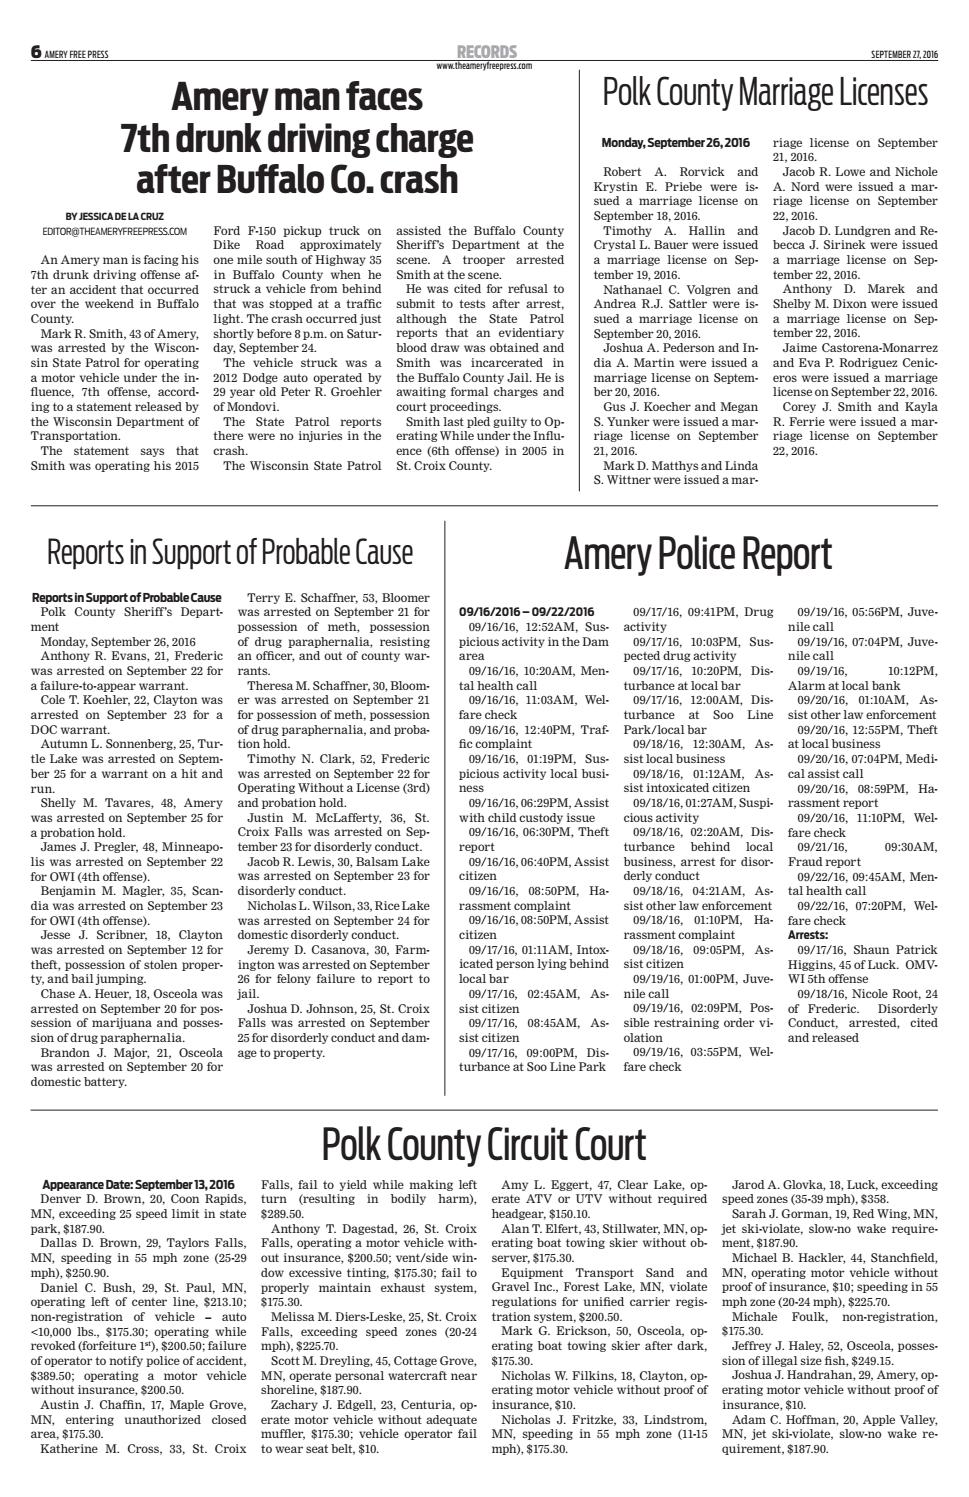 Afp 9 27 16 by Amery Free Press - issuu